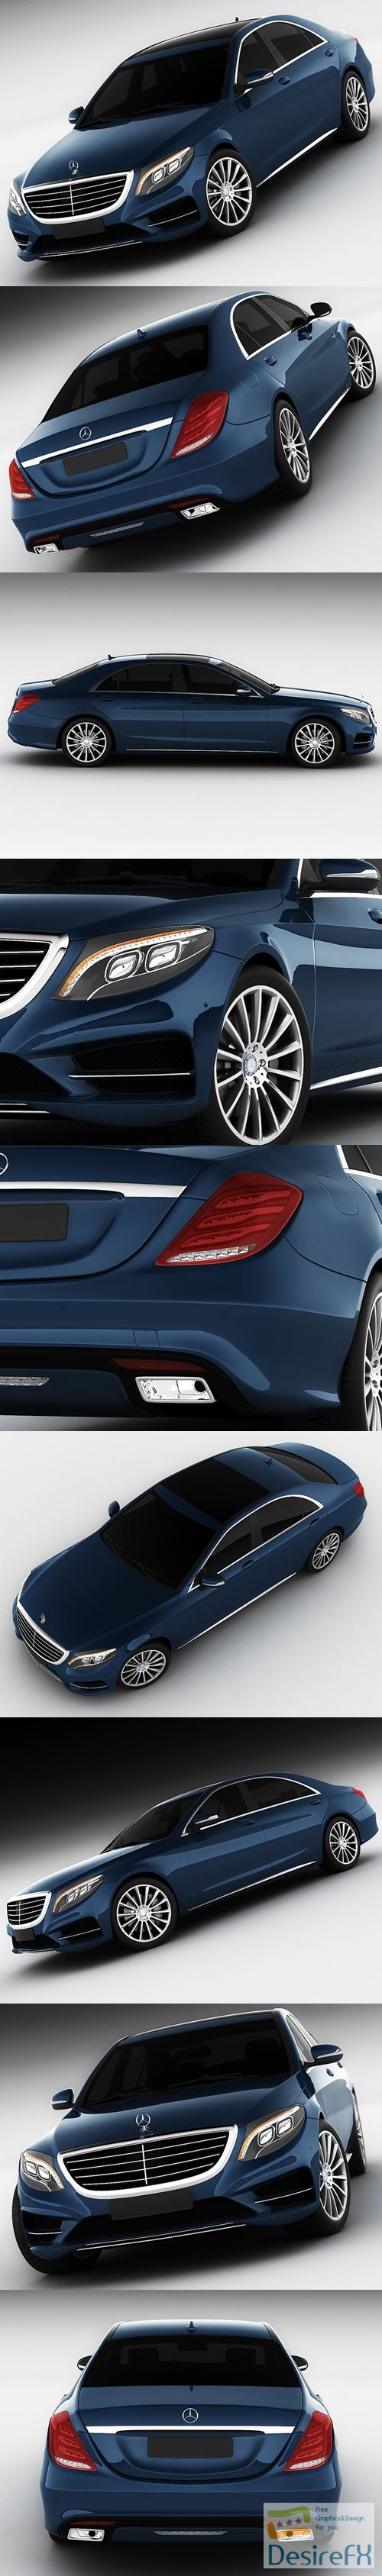 Mercedes-Benz S-class 2014 AMG 3D Model